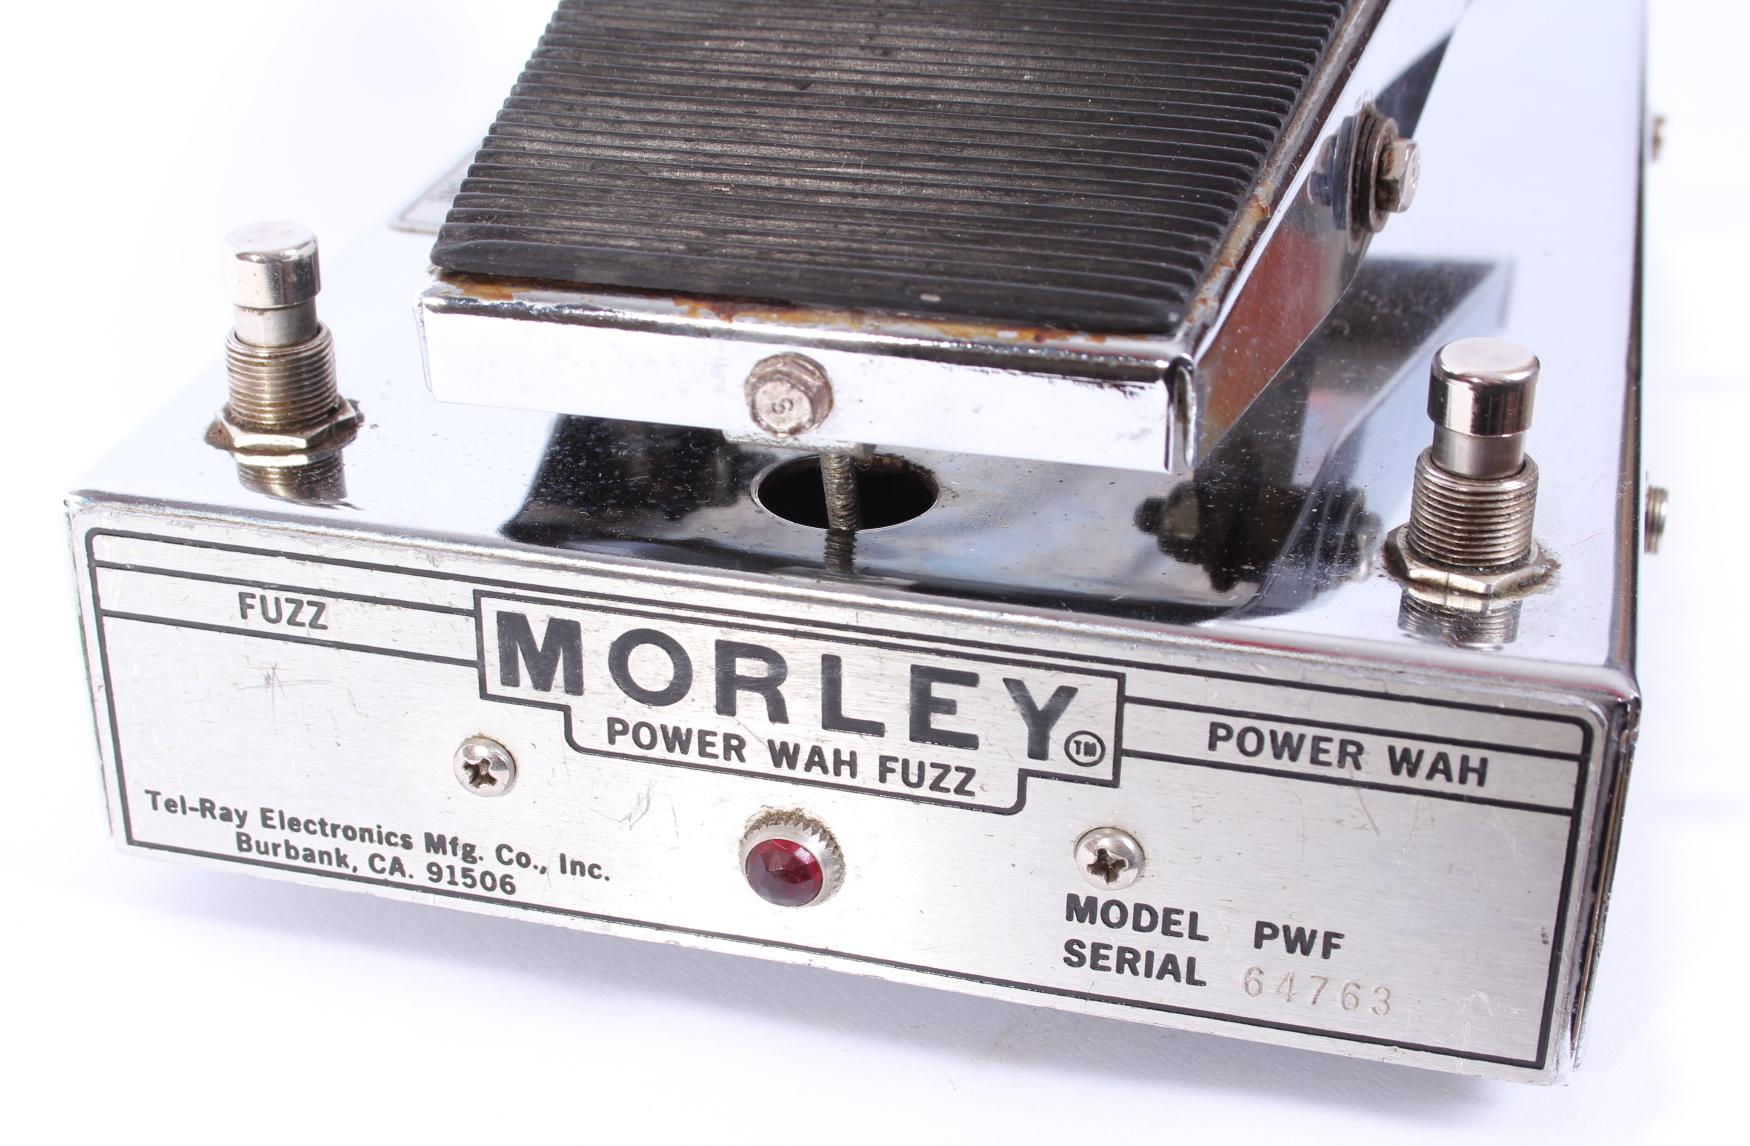 morley power wah fuzz 1970 chrome effect for sale yeahman 39 s guitars. Black Bedroom Furniture Sets. Home Design Ideas